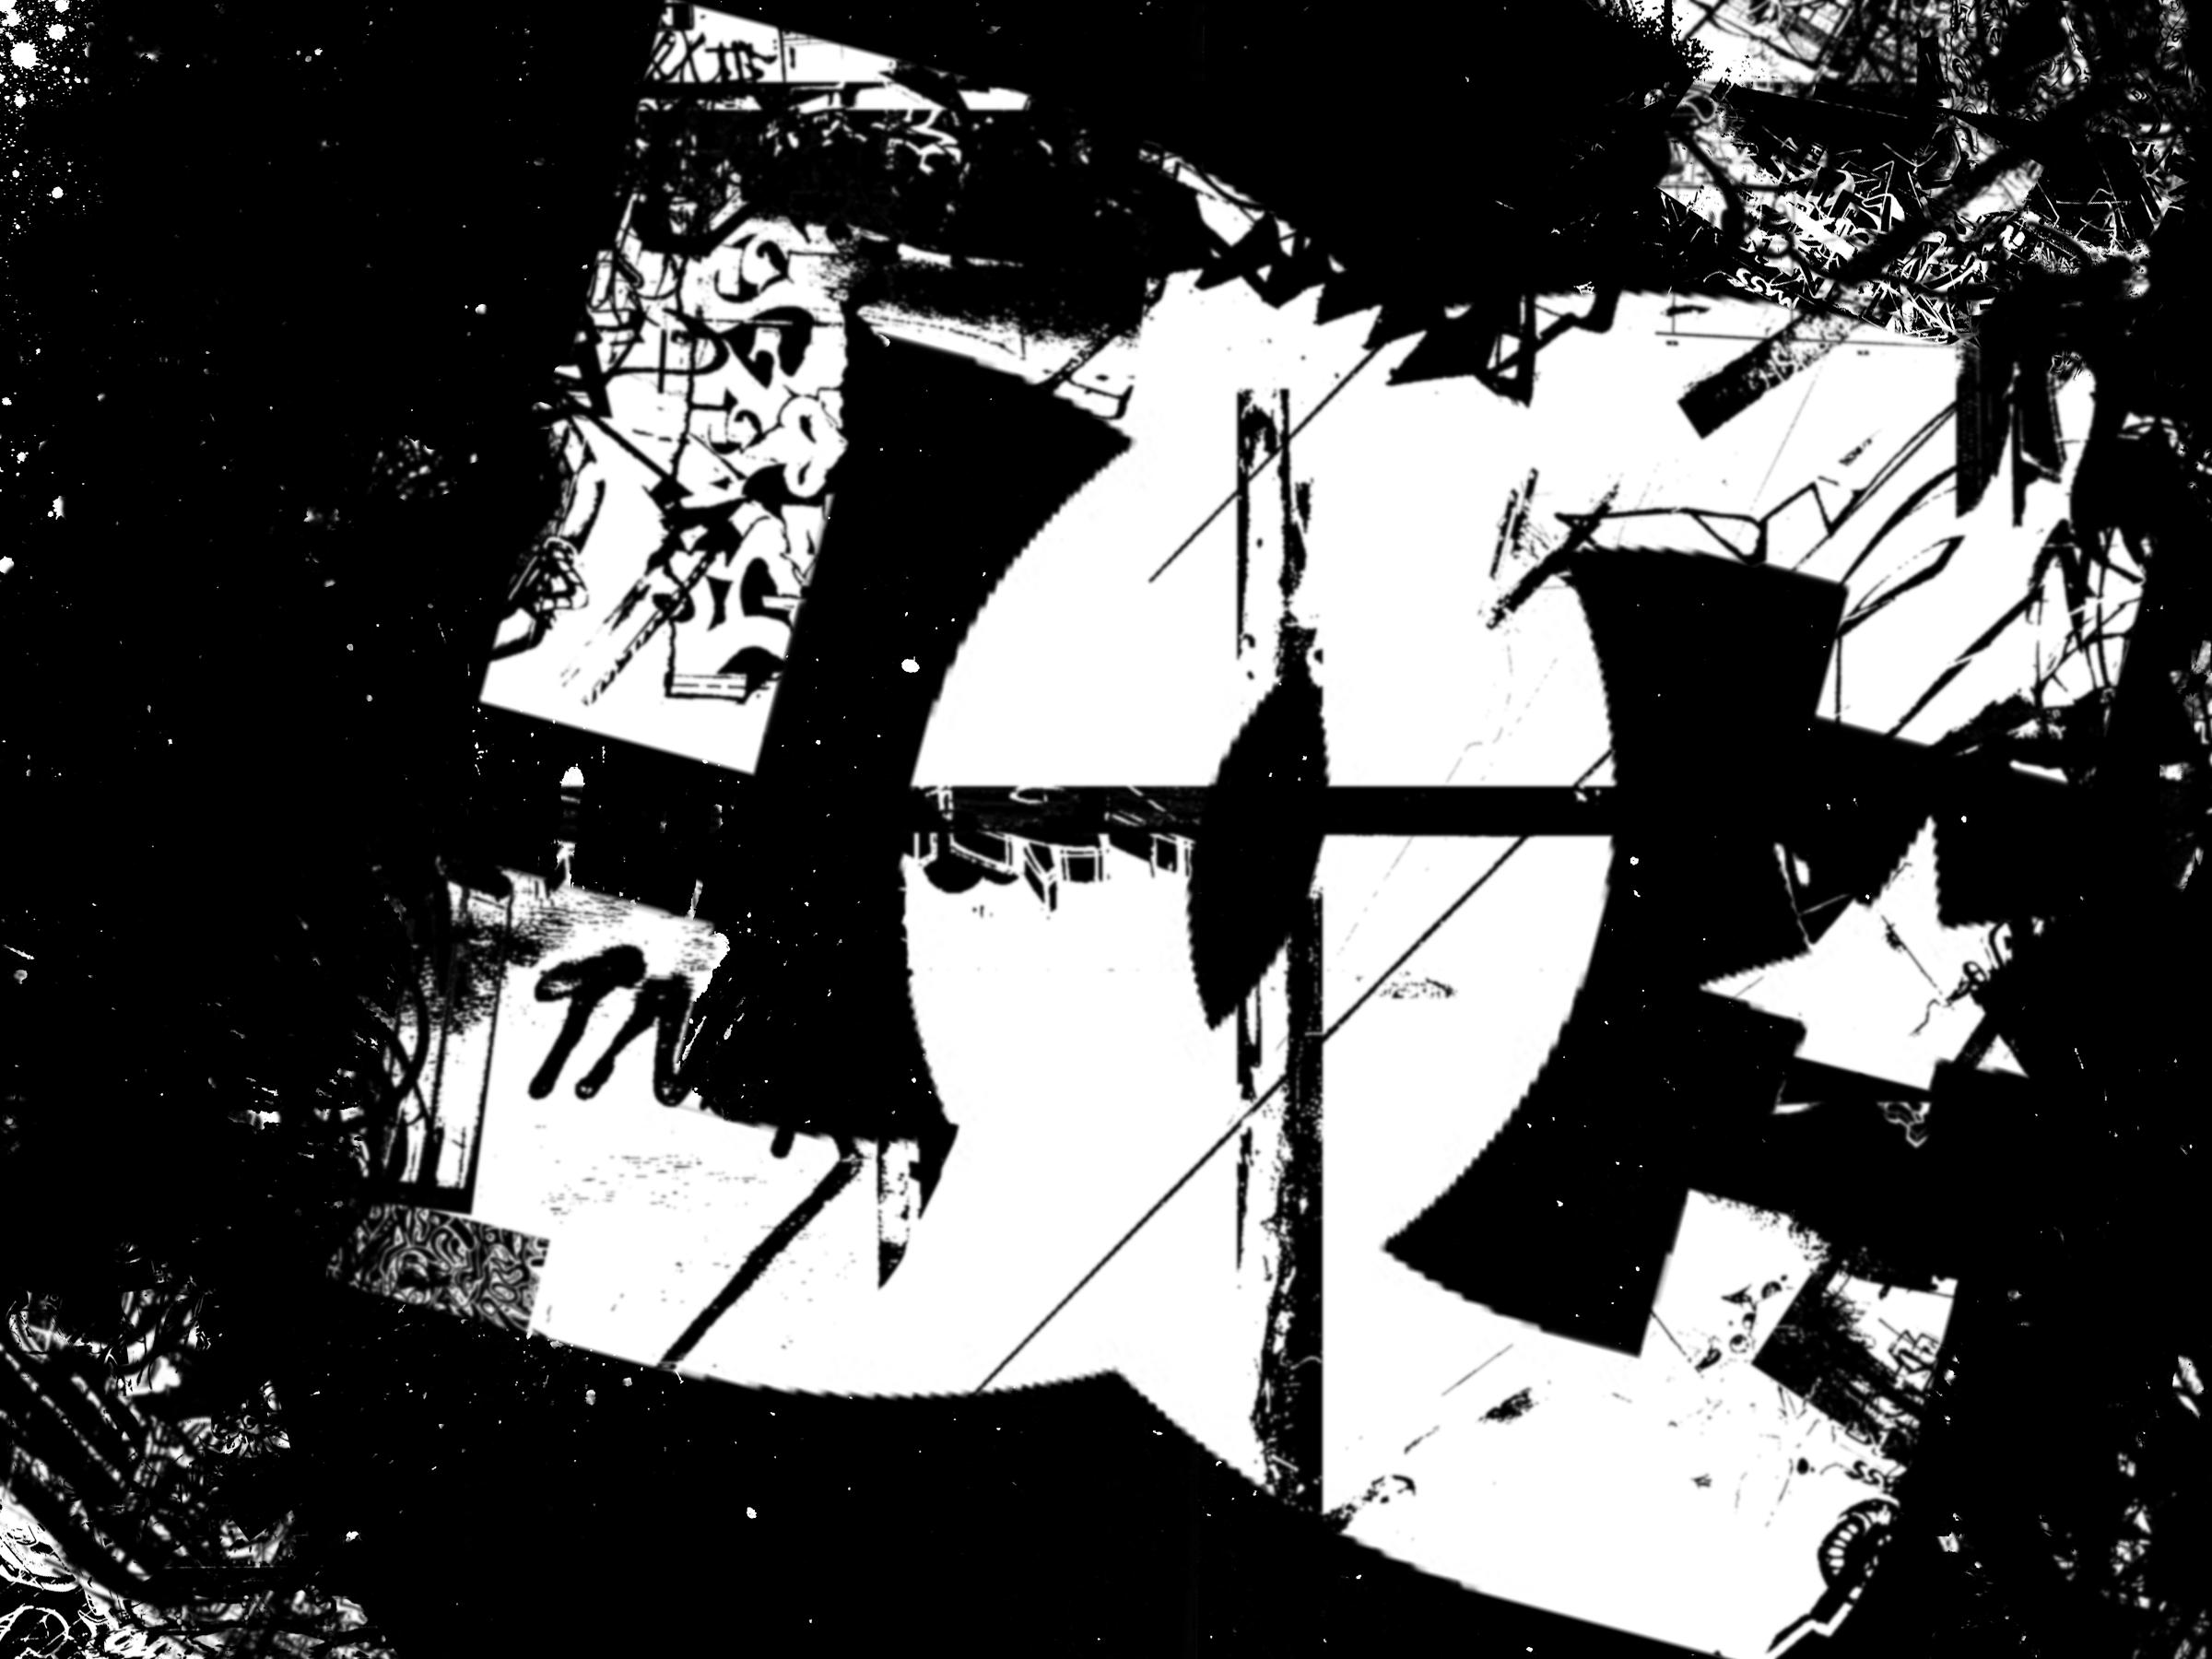 dc shoes logo backgrounds hd Skateboard logo, Skateboard